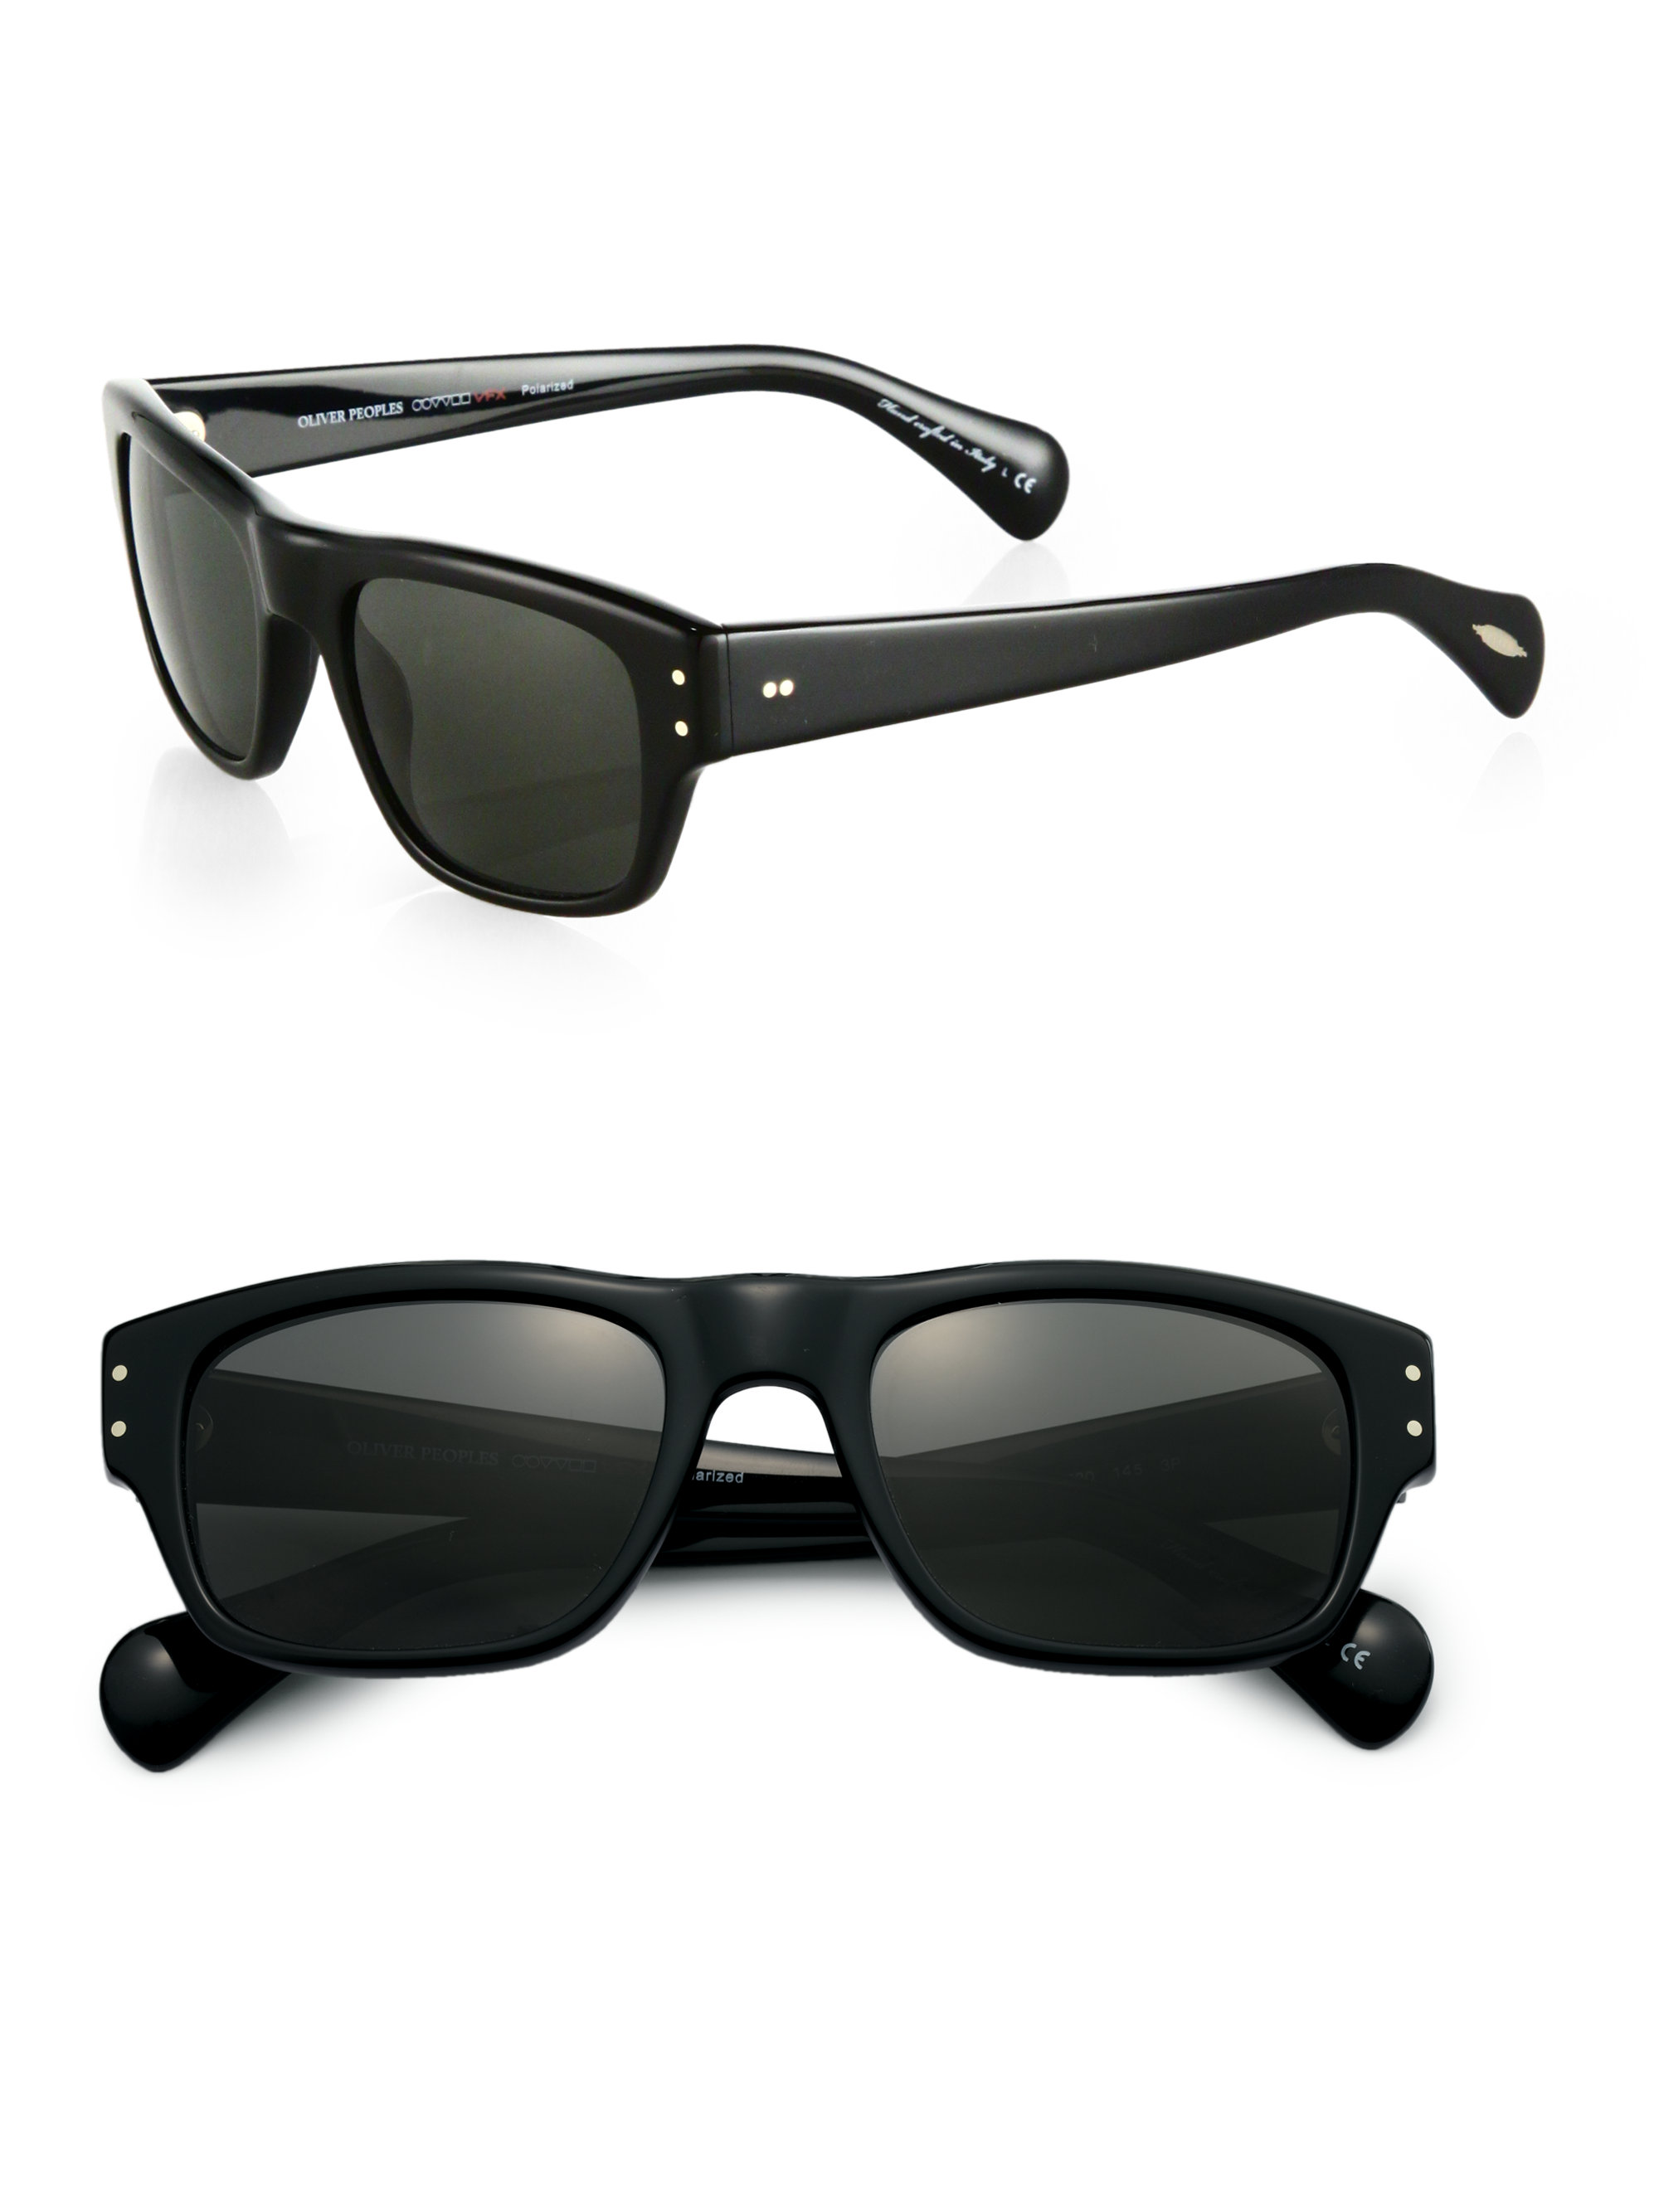 a42b2c975d Oliver Peoples Sunglasses Mens